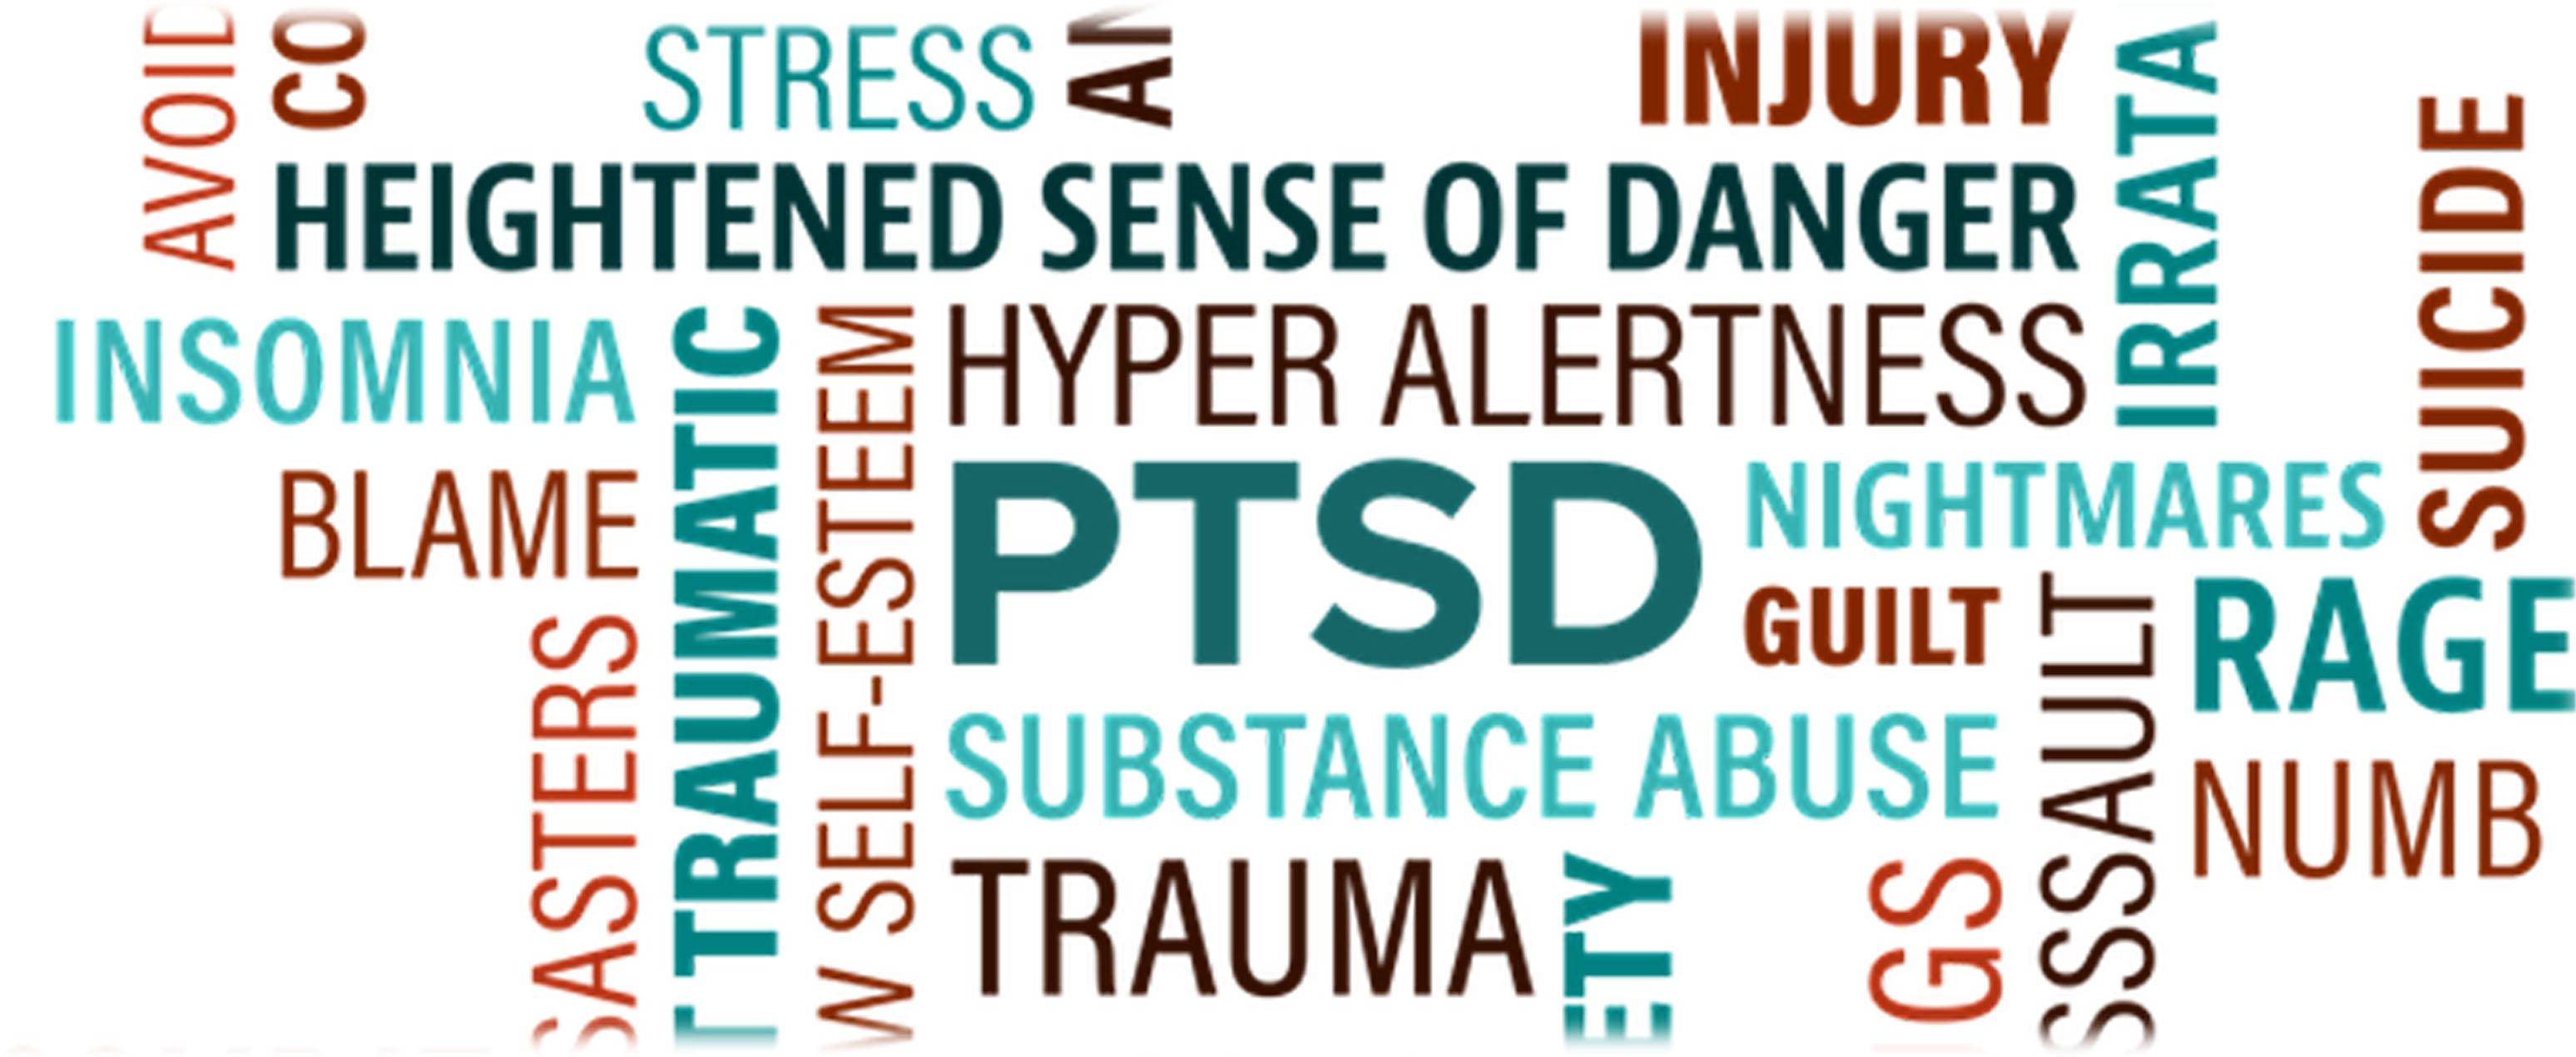 PTSD @ cbtcounsellor.com